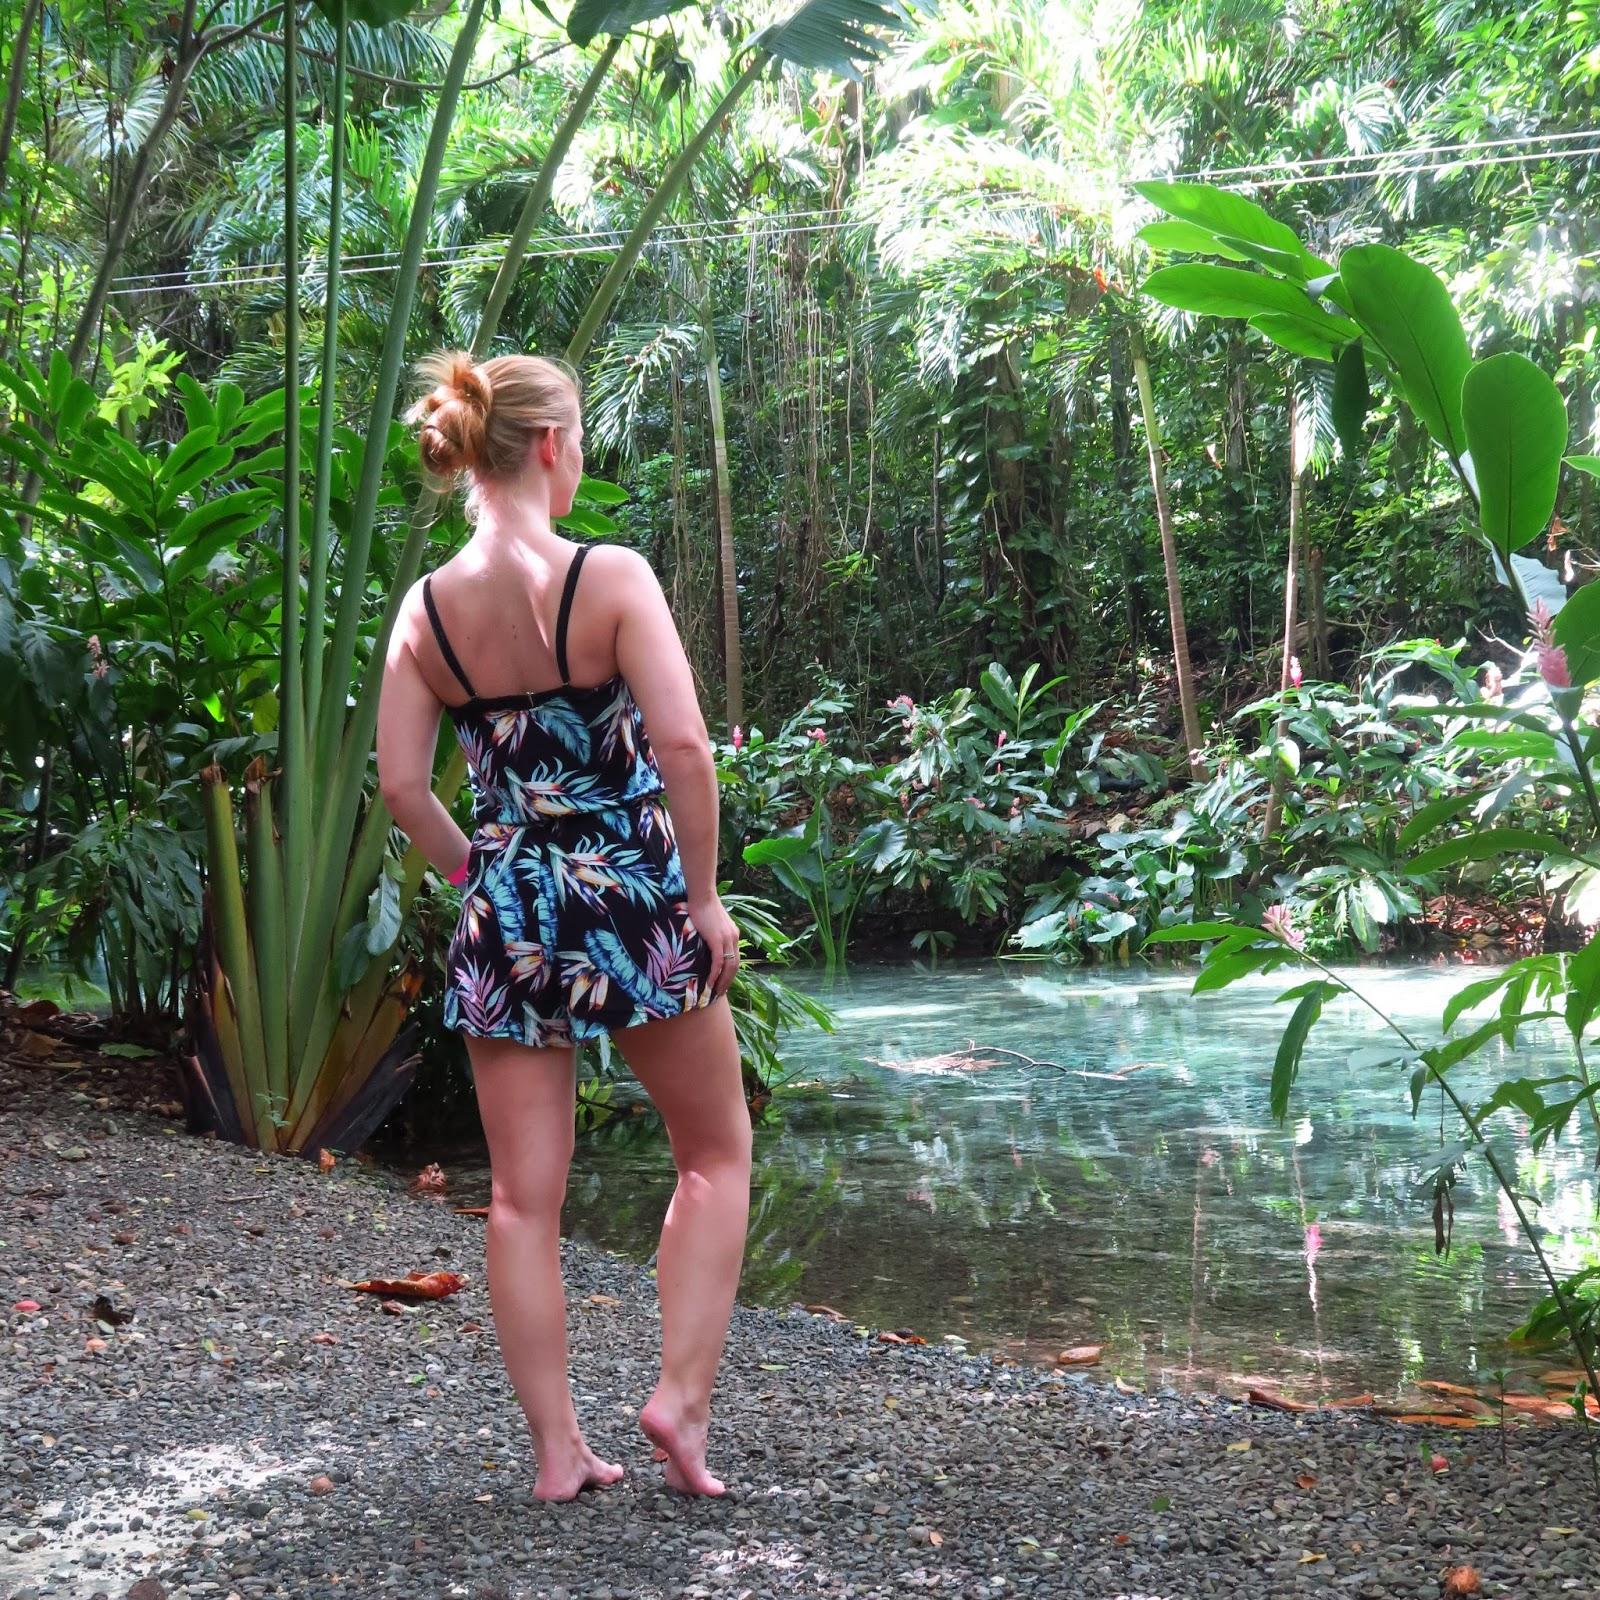 bahamas, cayman islands, chichén itzá, costa maya, cozumel, dunn's river falls, jamaika, karibik, kreuzfahrt, maya ruinen, mexiko, miami, msc divina, reisebericht, royal caribbean, travel, tulum, urlaub,